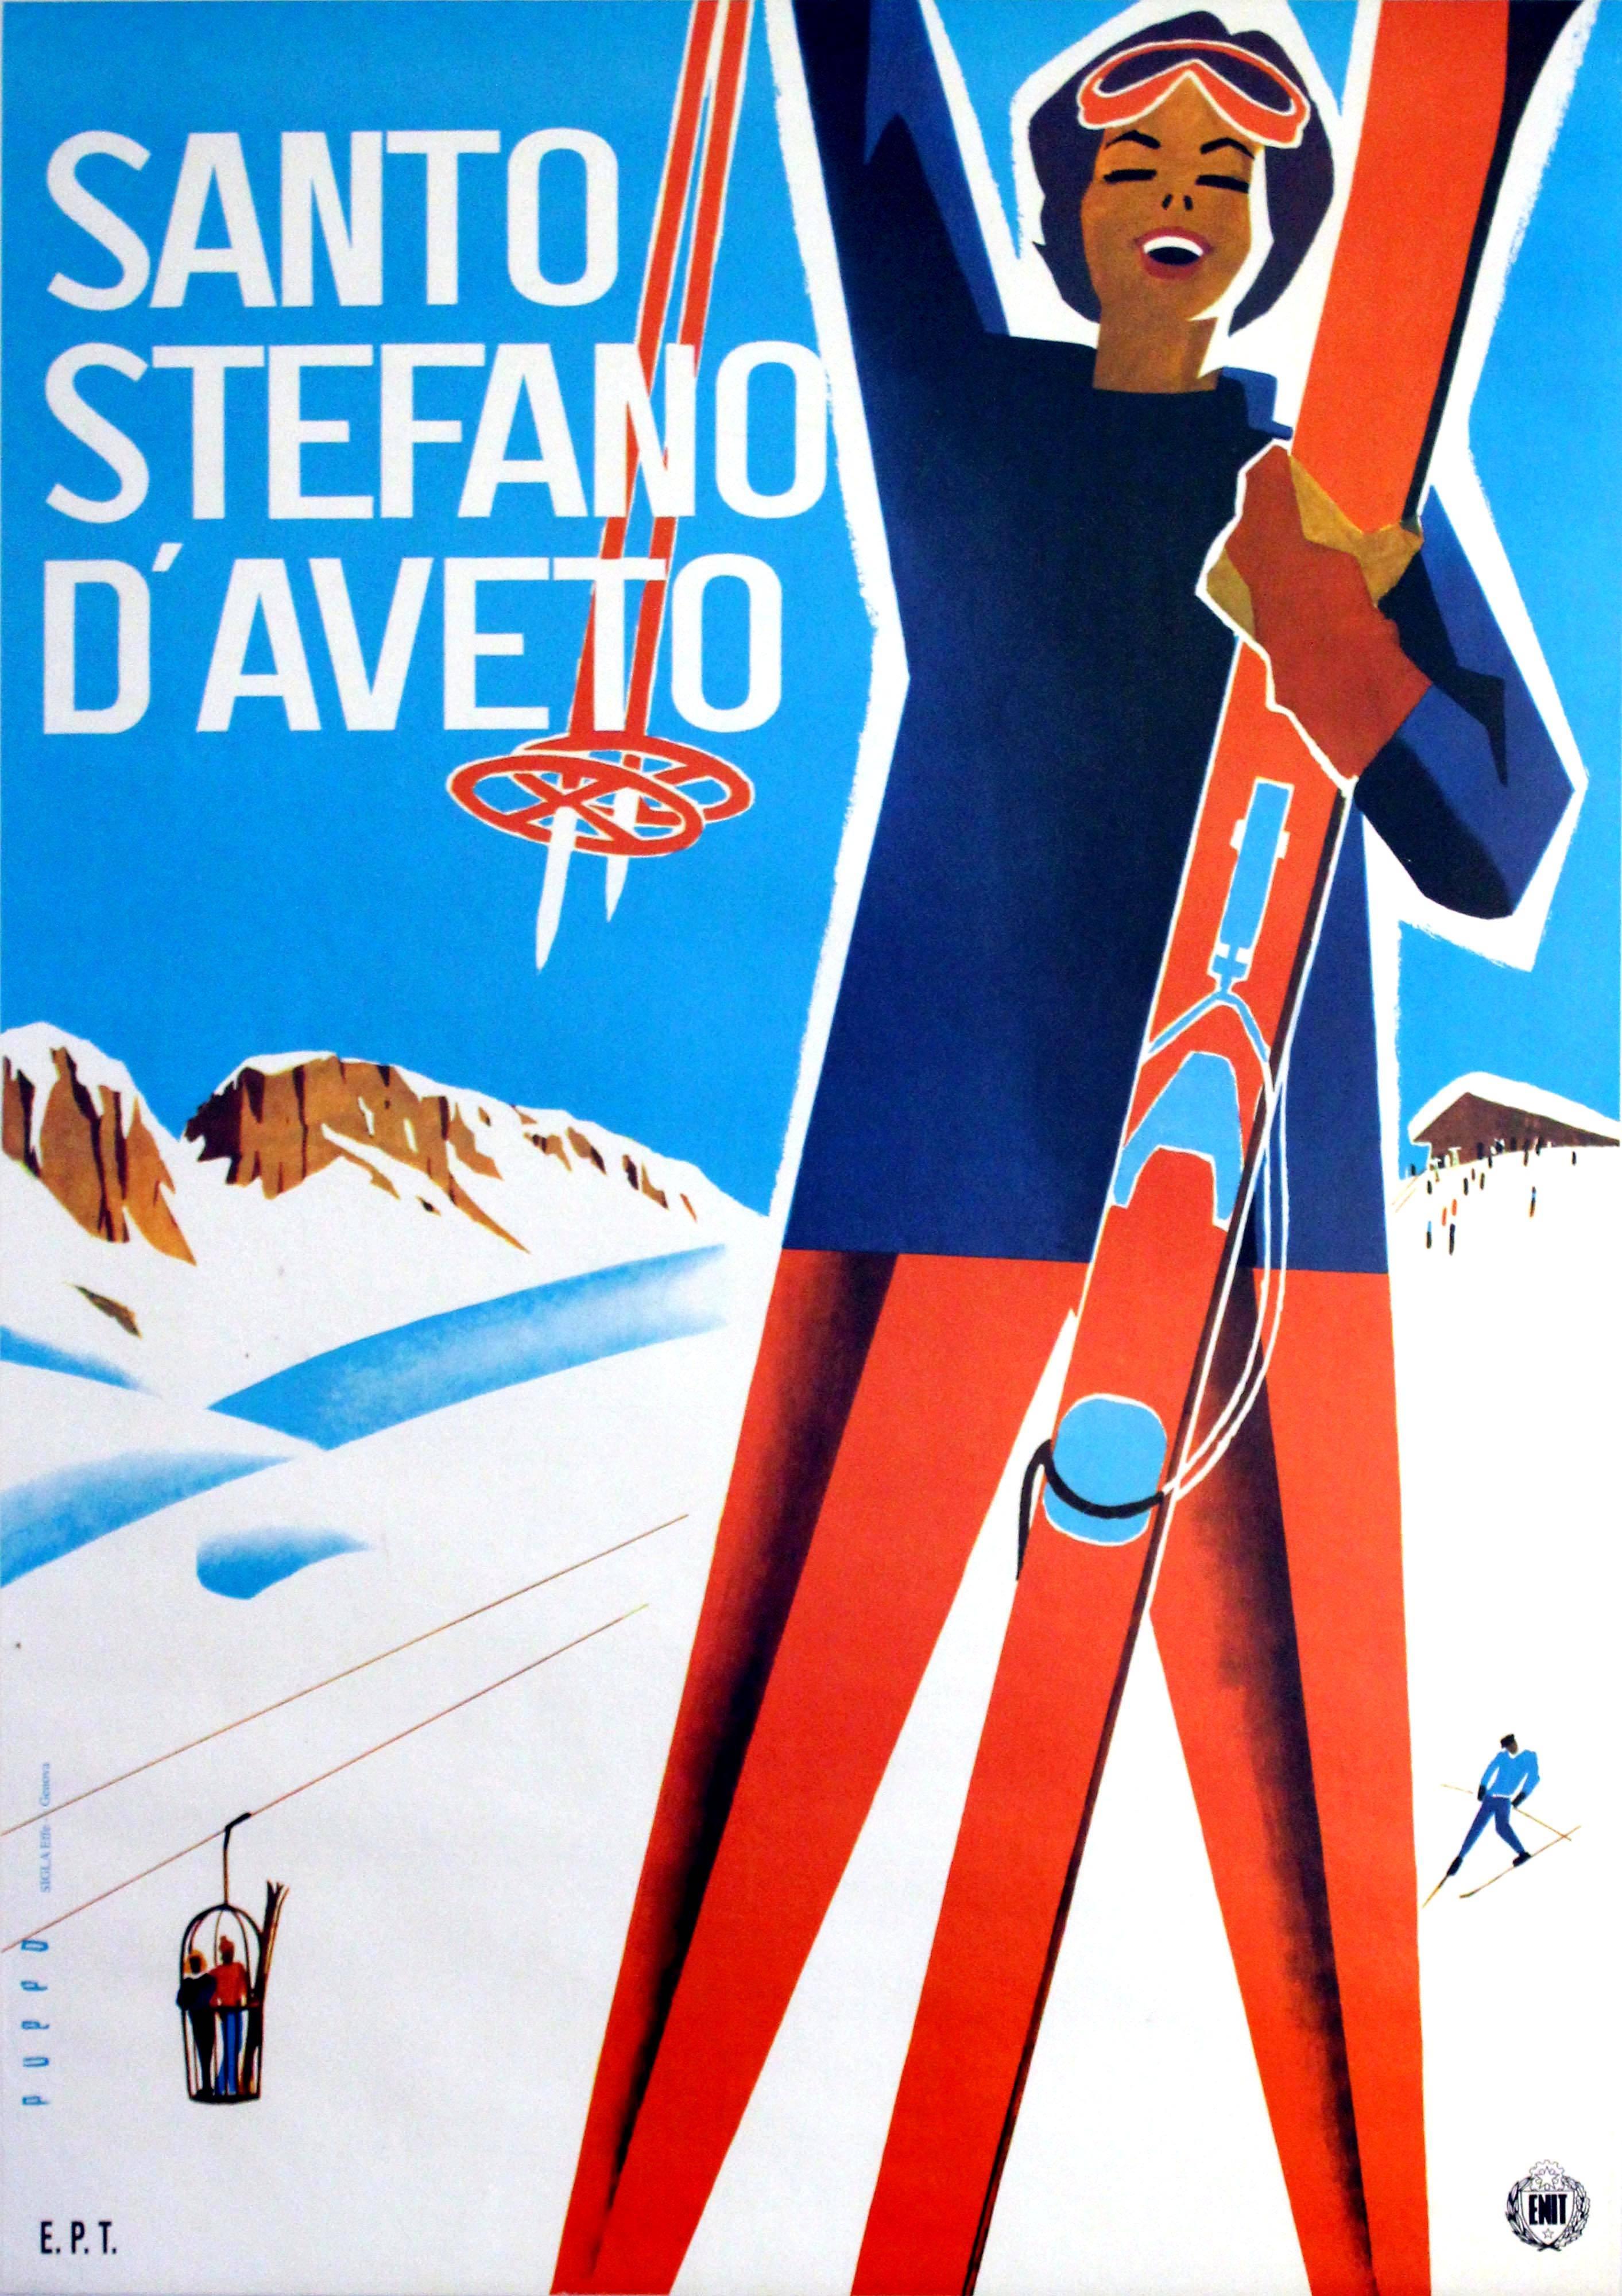 Original Vintage ENIT Skiing Poster Advertising Santo Stefano d'Aveto Italy